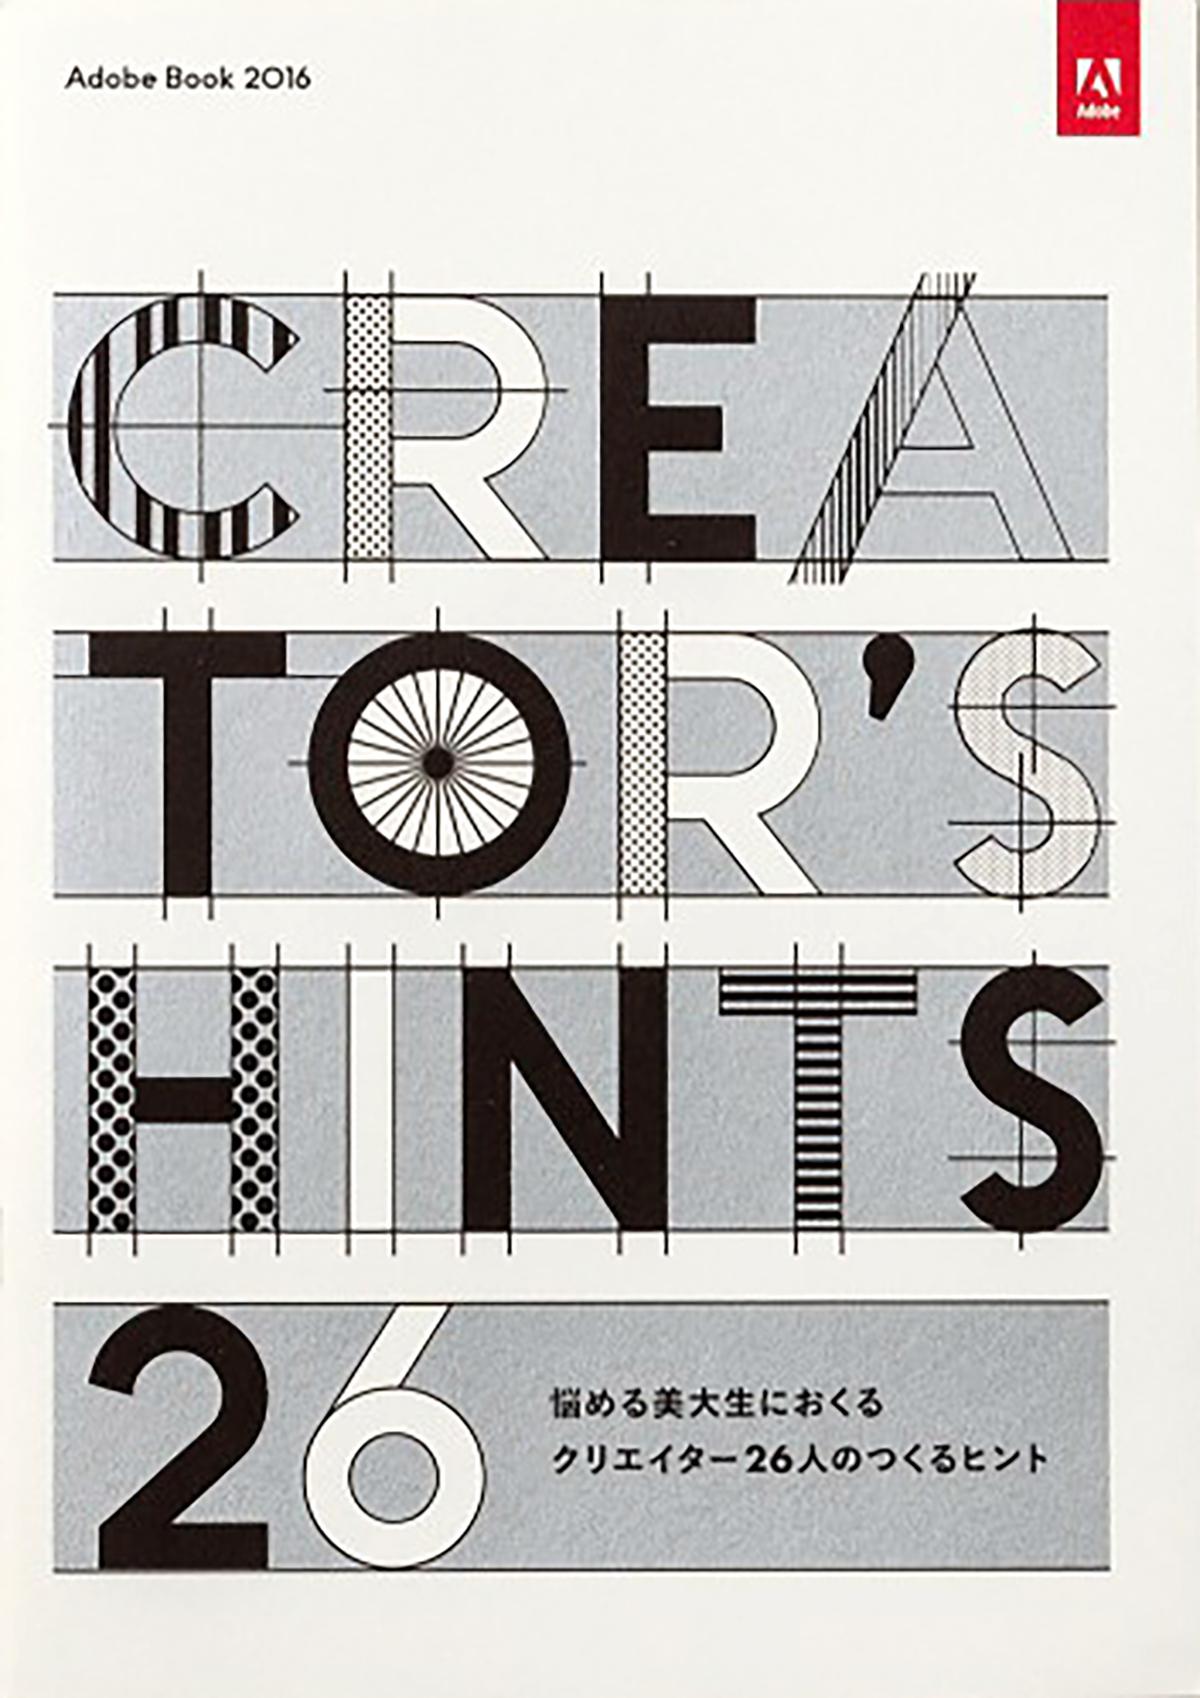 Adobe Book 2016